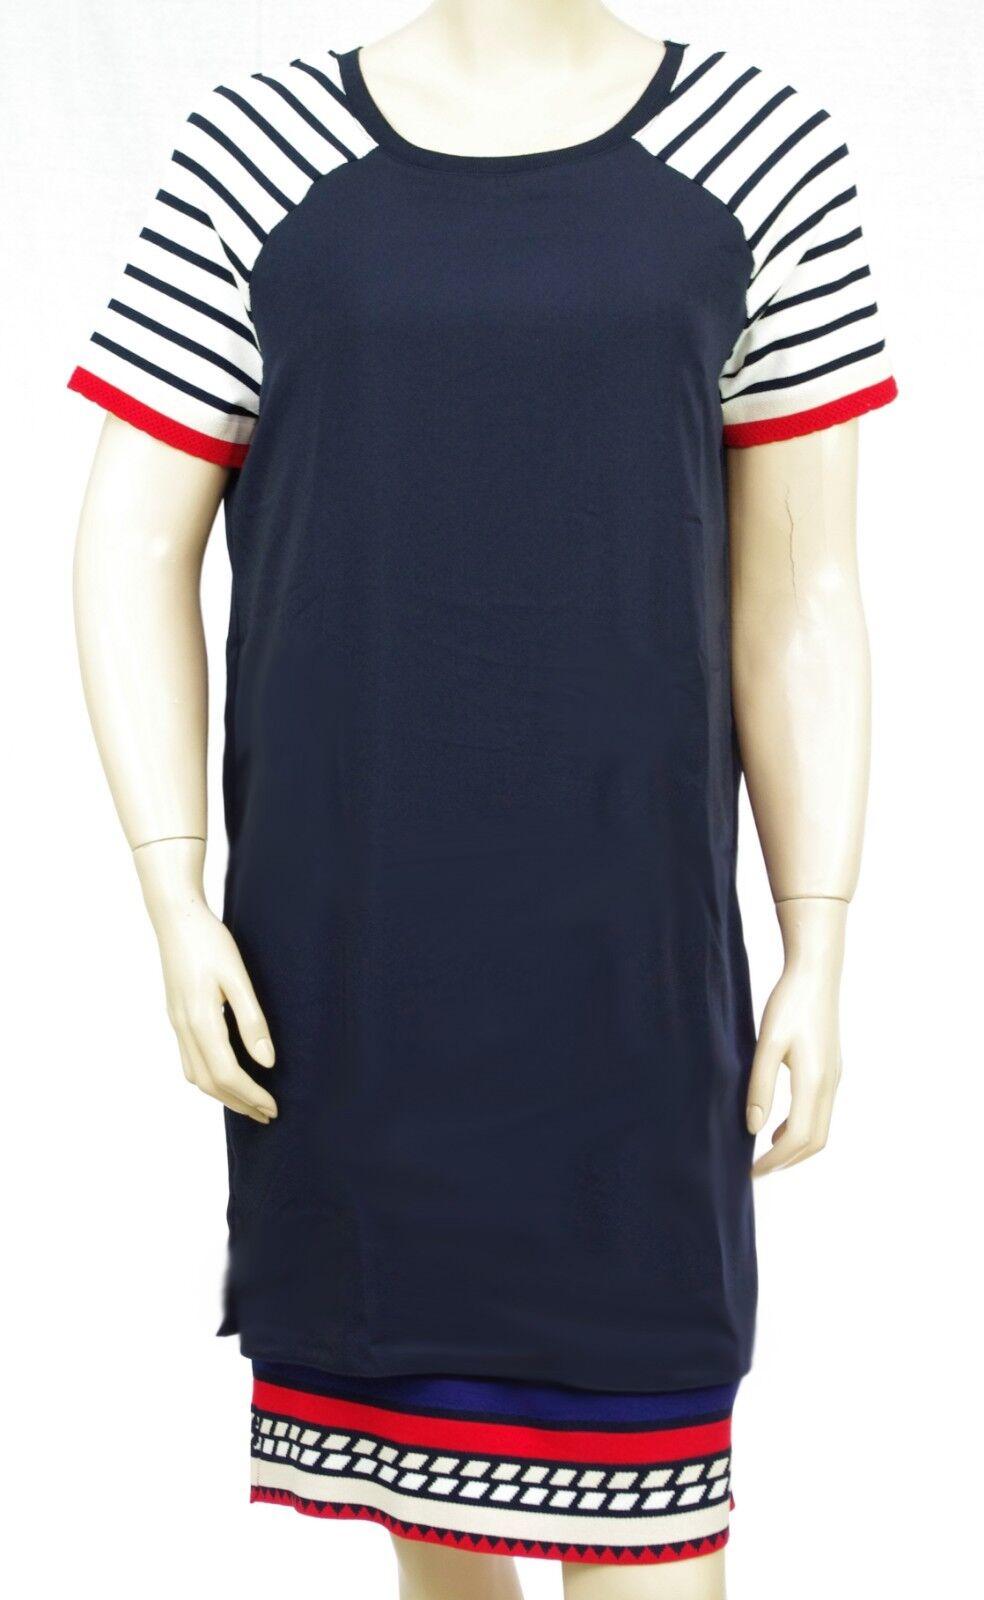 DESIGUAL robe voile Vest OLIVIA bleu marine femme 18SWVWBY 5000